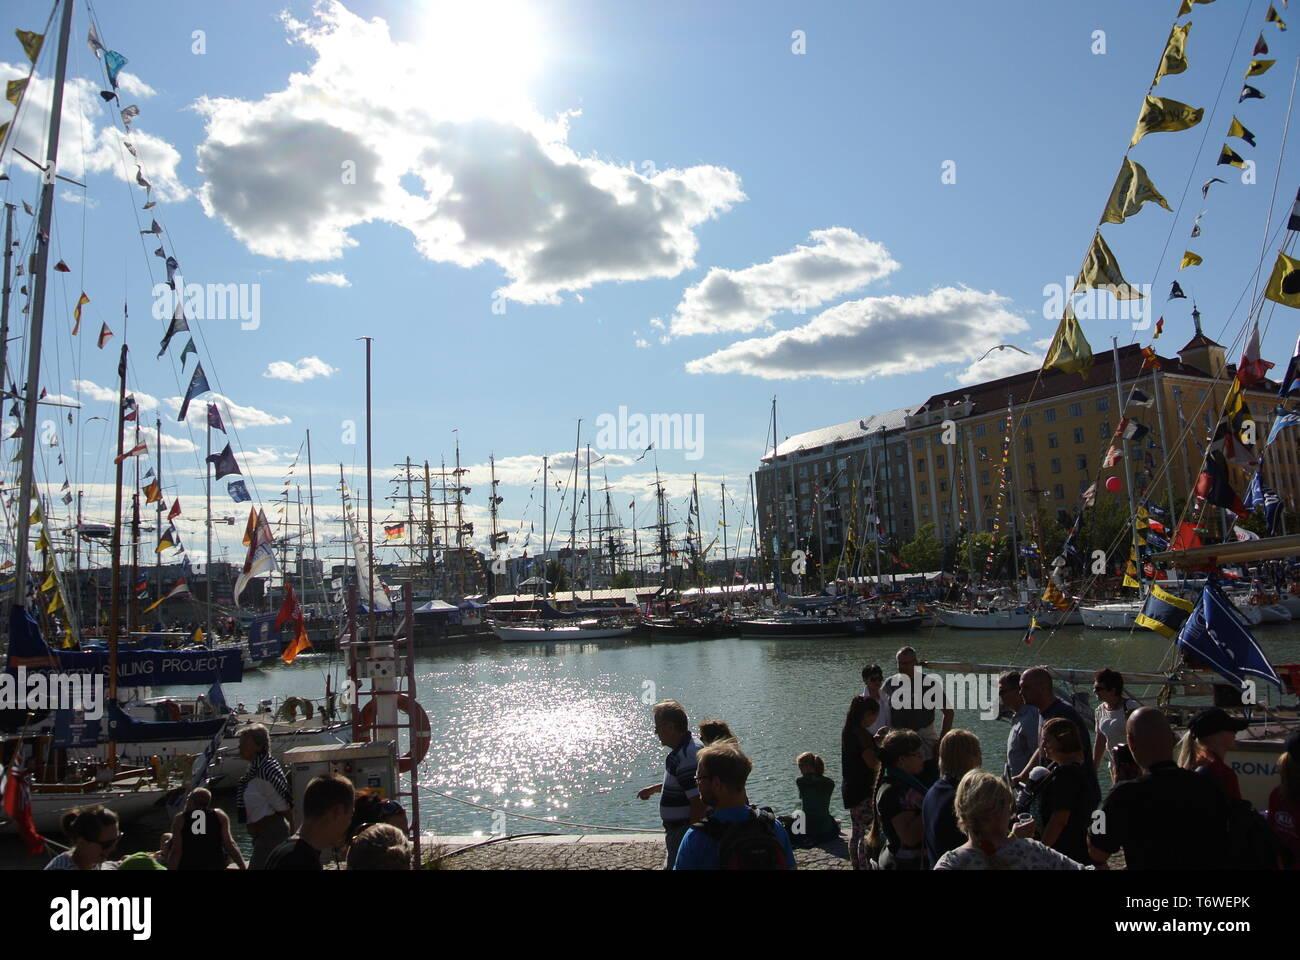 Helsinki Tall Ship Race - Stock Image